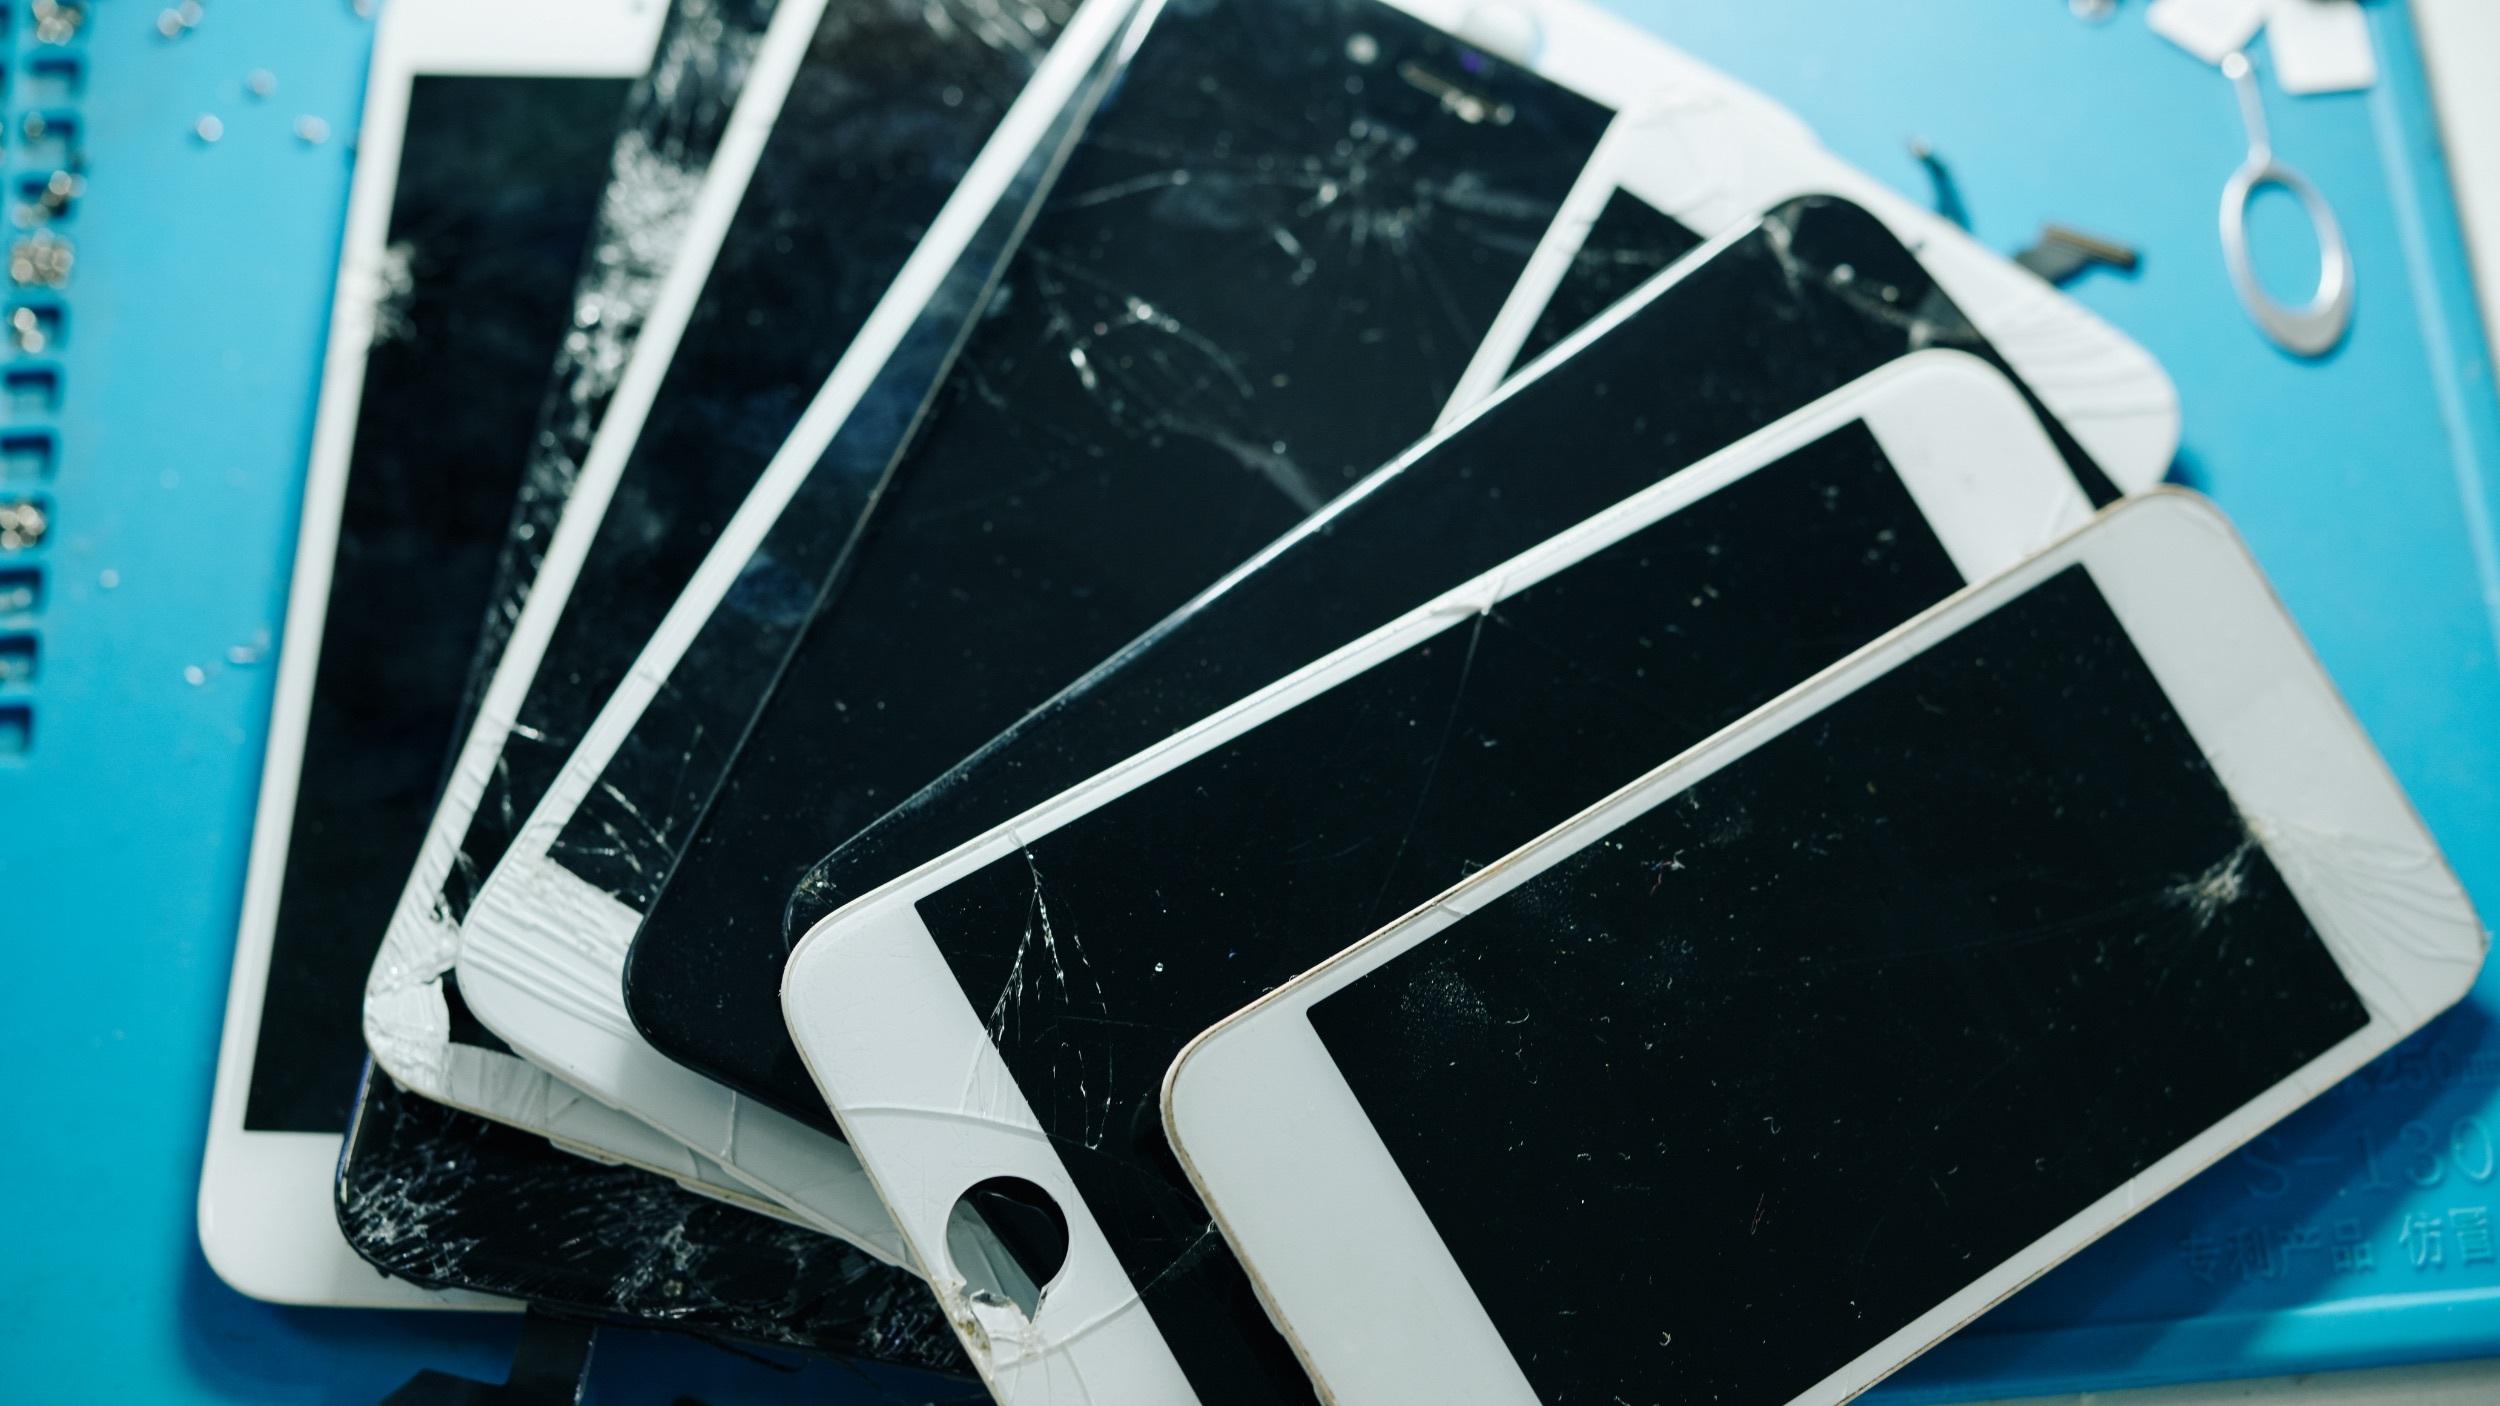 several smartphones with broken or cracked screens